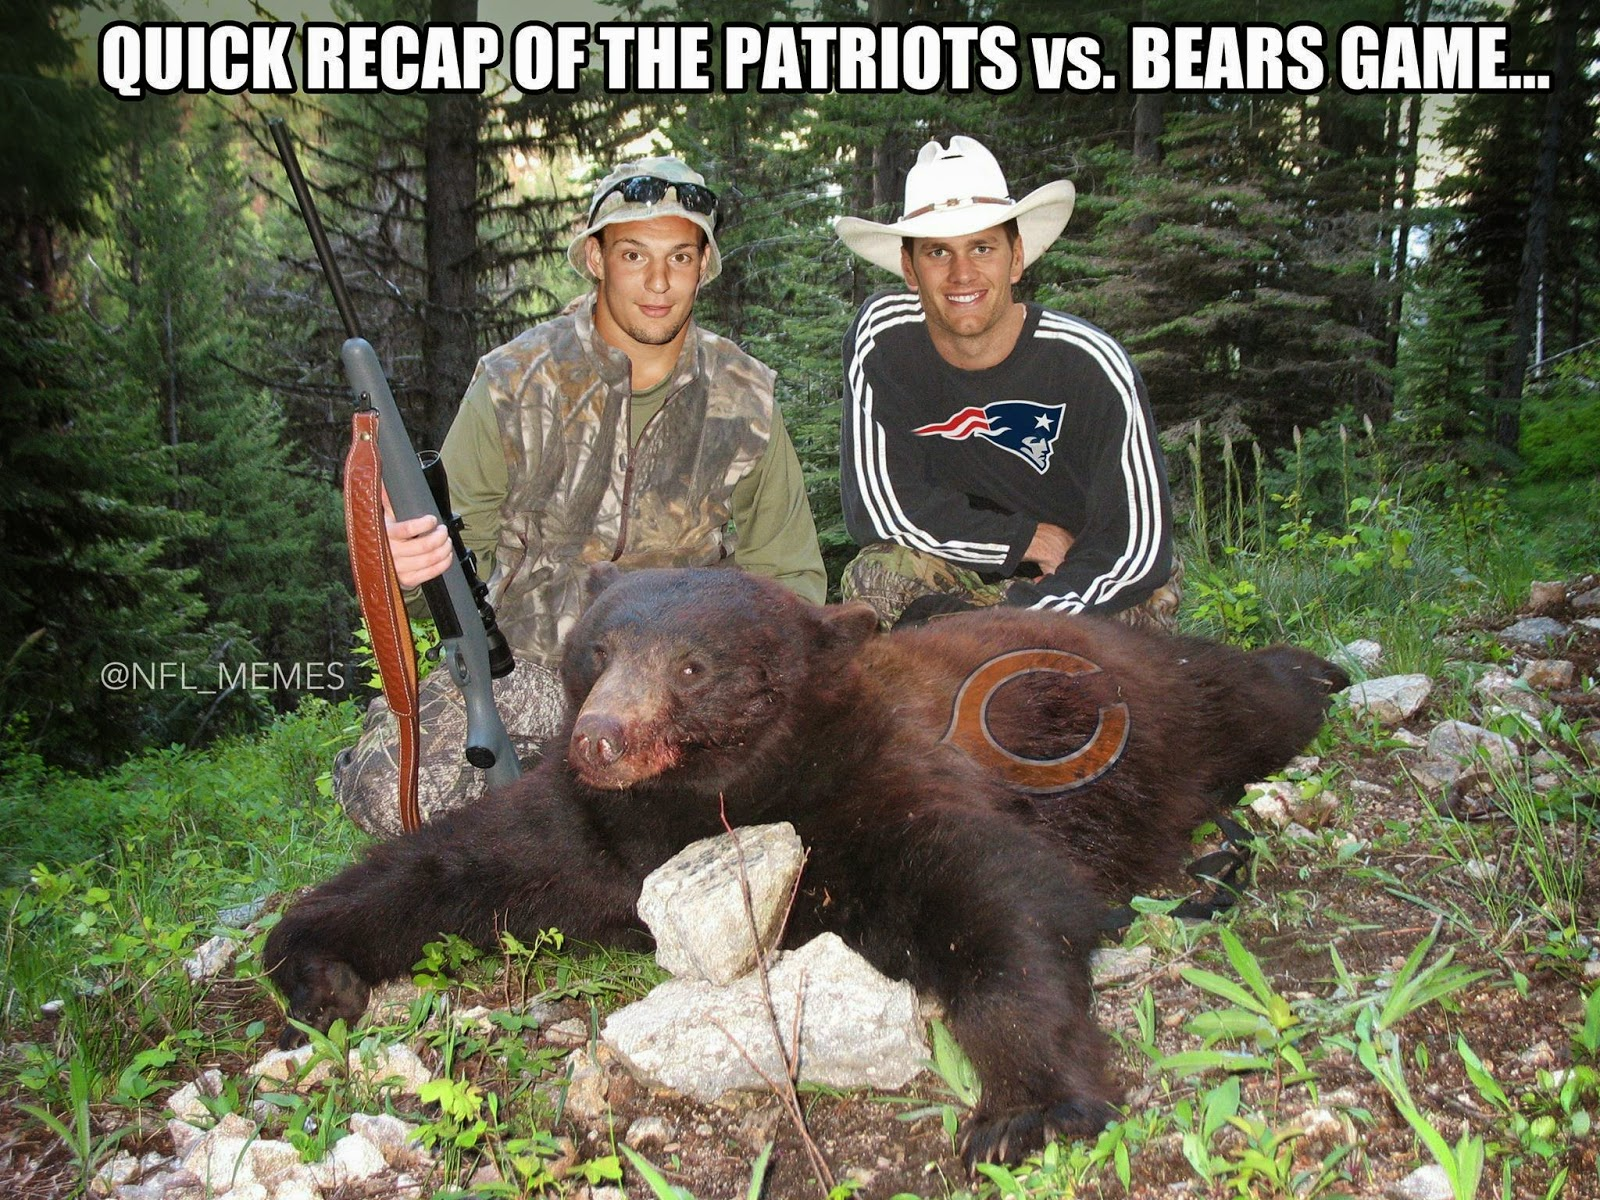 quick recap of the patriots vs. bears game...